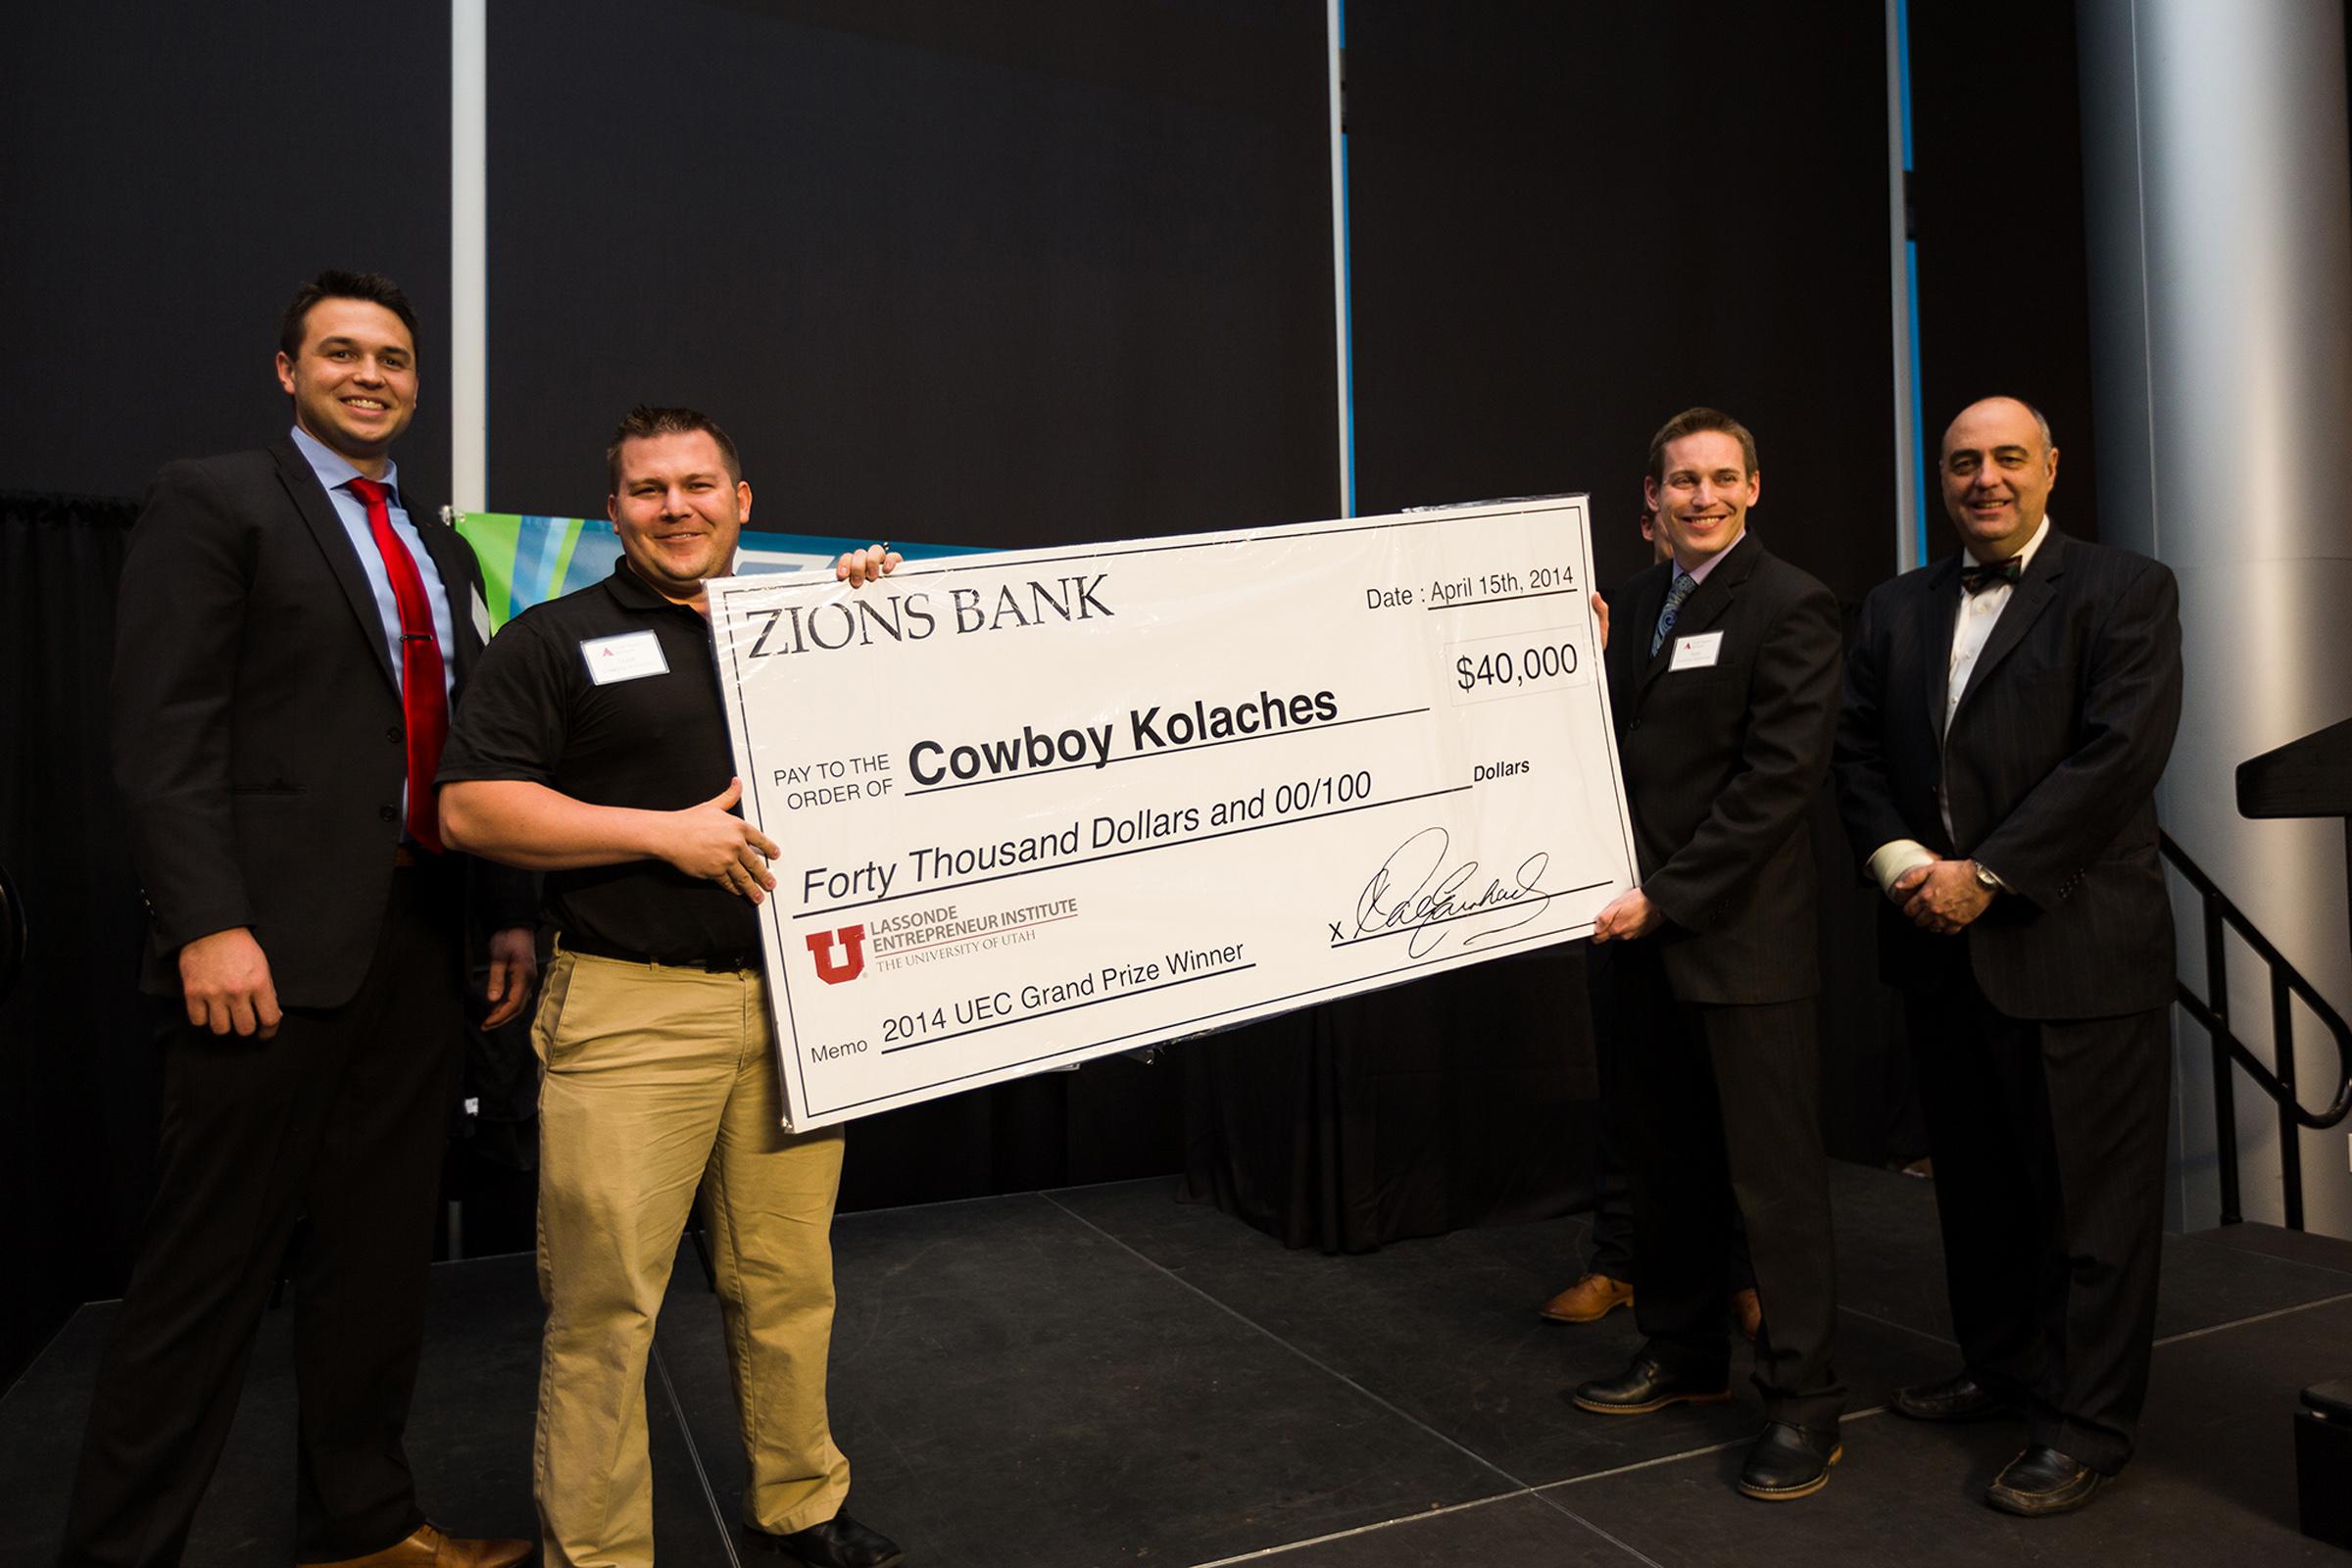 Cowboy Kolaches won the $40,000 grand prize at the Utah Entrepreneur Challenge at the U on April 11, 2014.